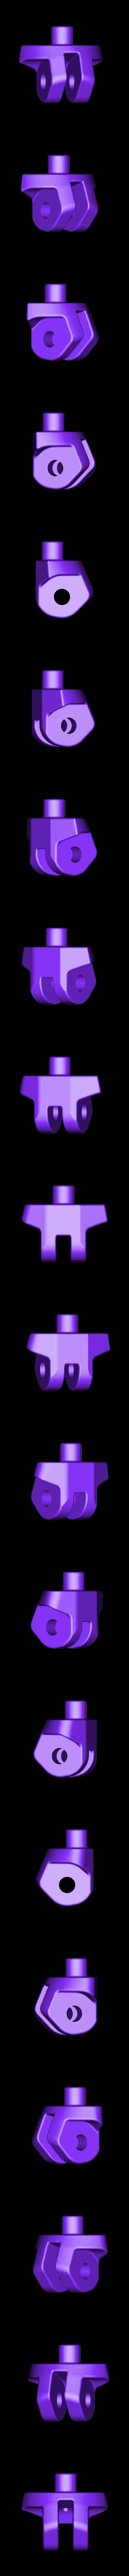 pouce_-_m%C3%A9tacarpe_2.stl Download free STL file Articulated hand • 3D printer model, NOP21